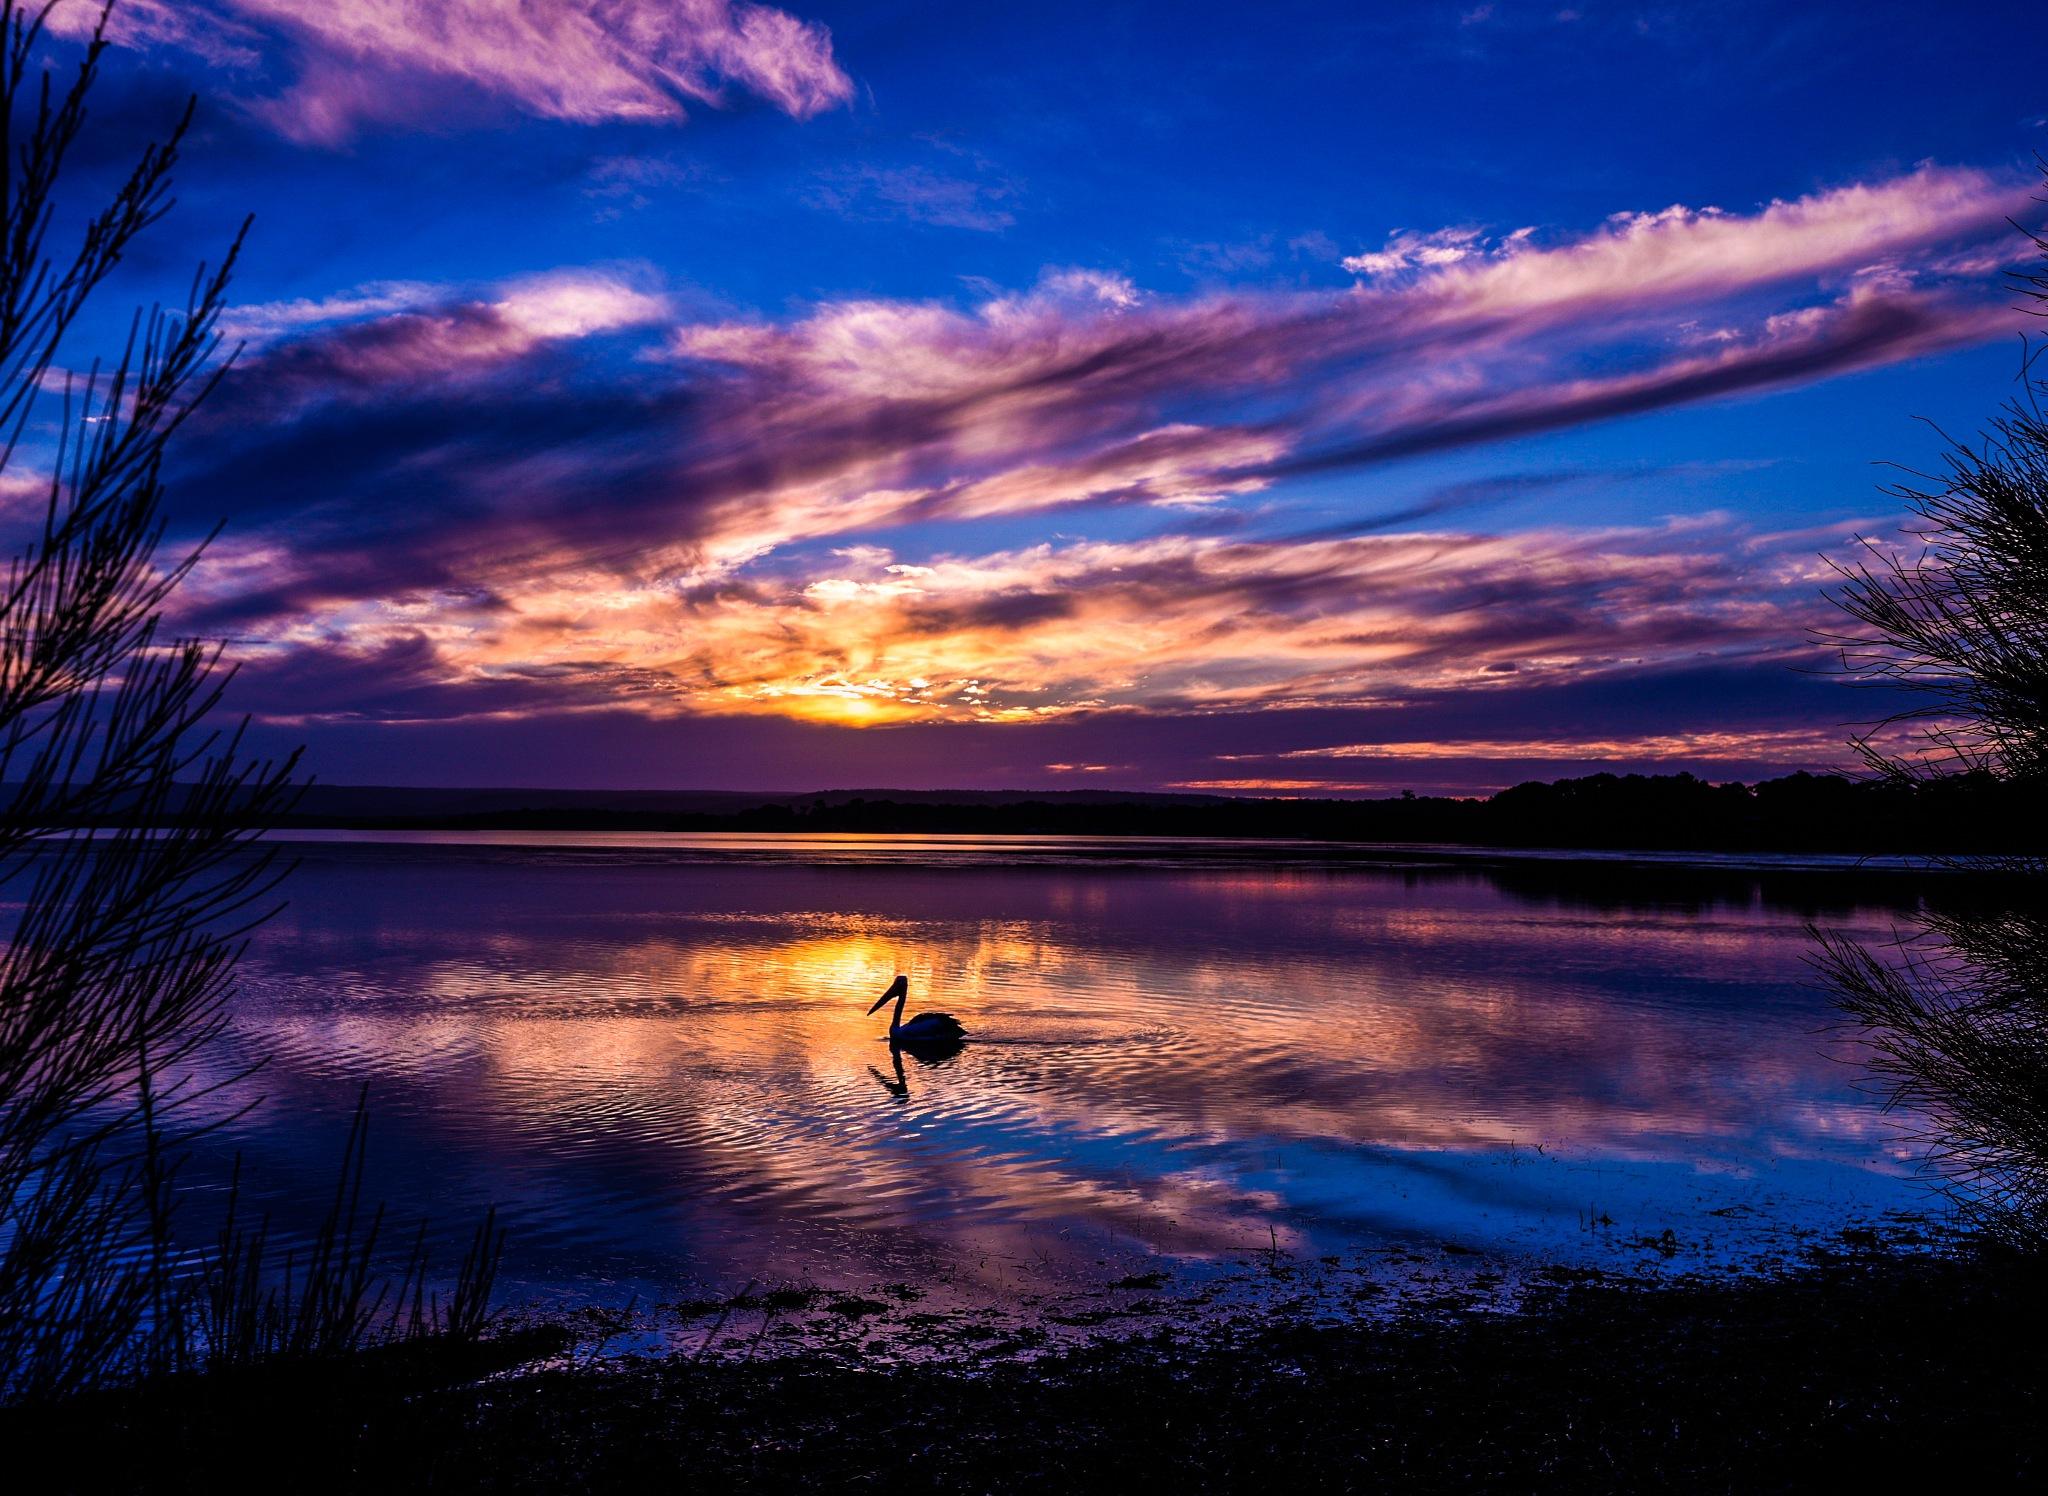 Jonathon Livingston Pelican by Trevor McKinnon